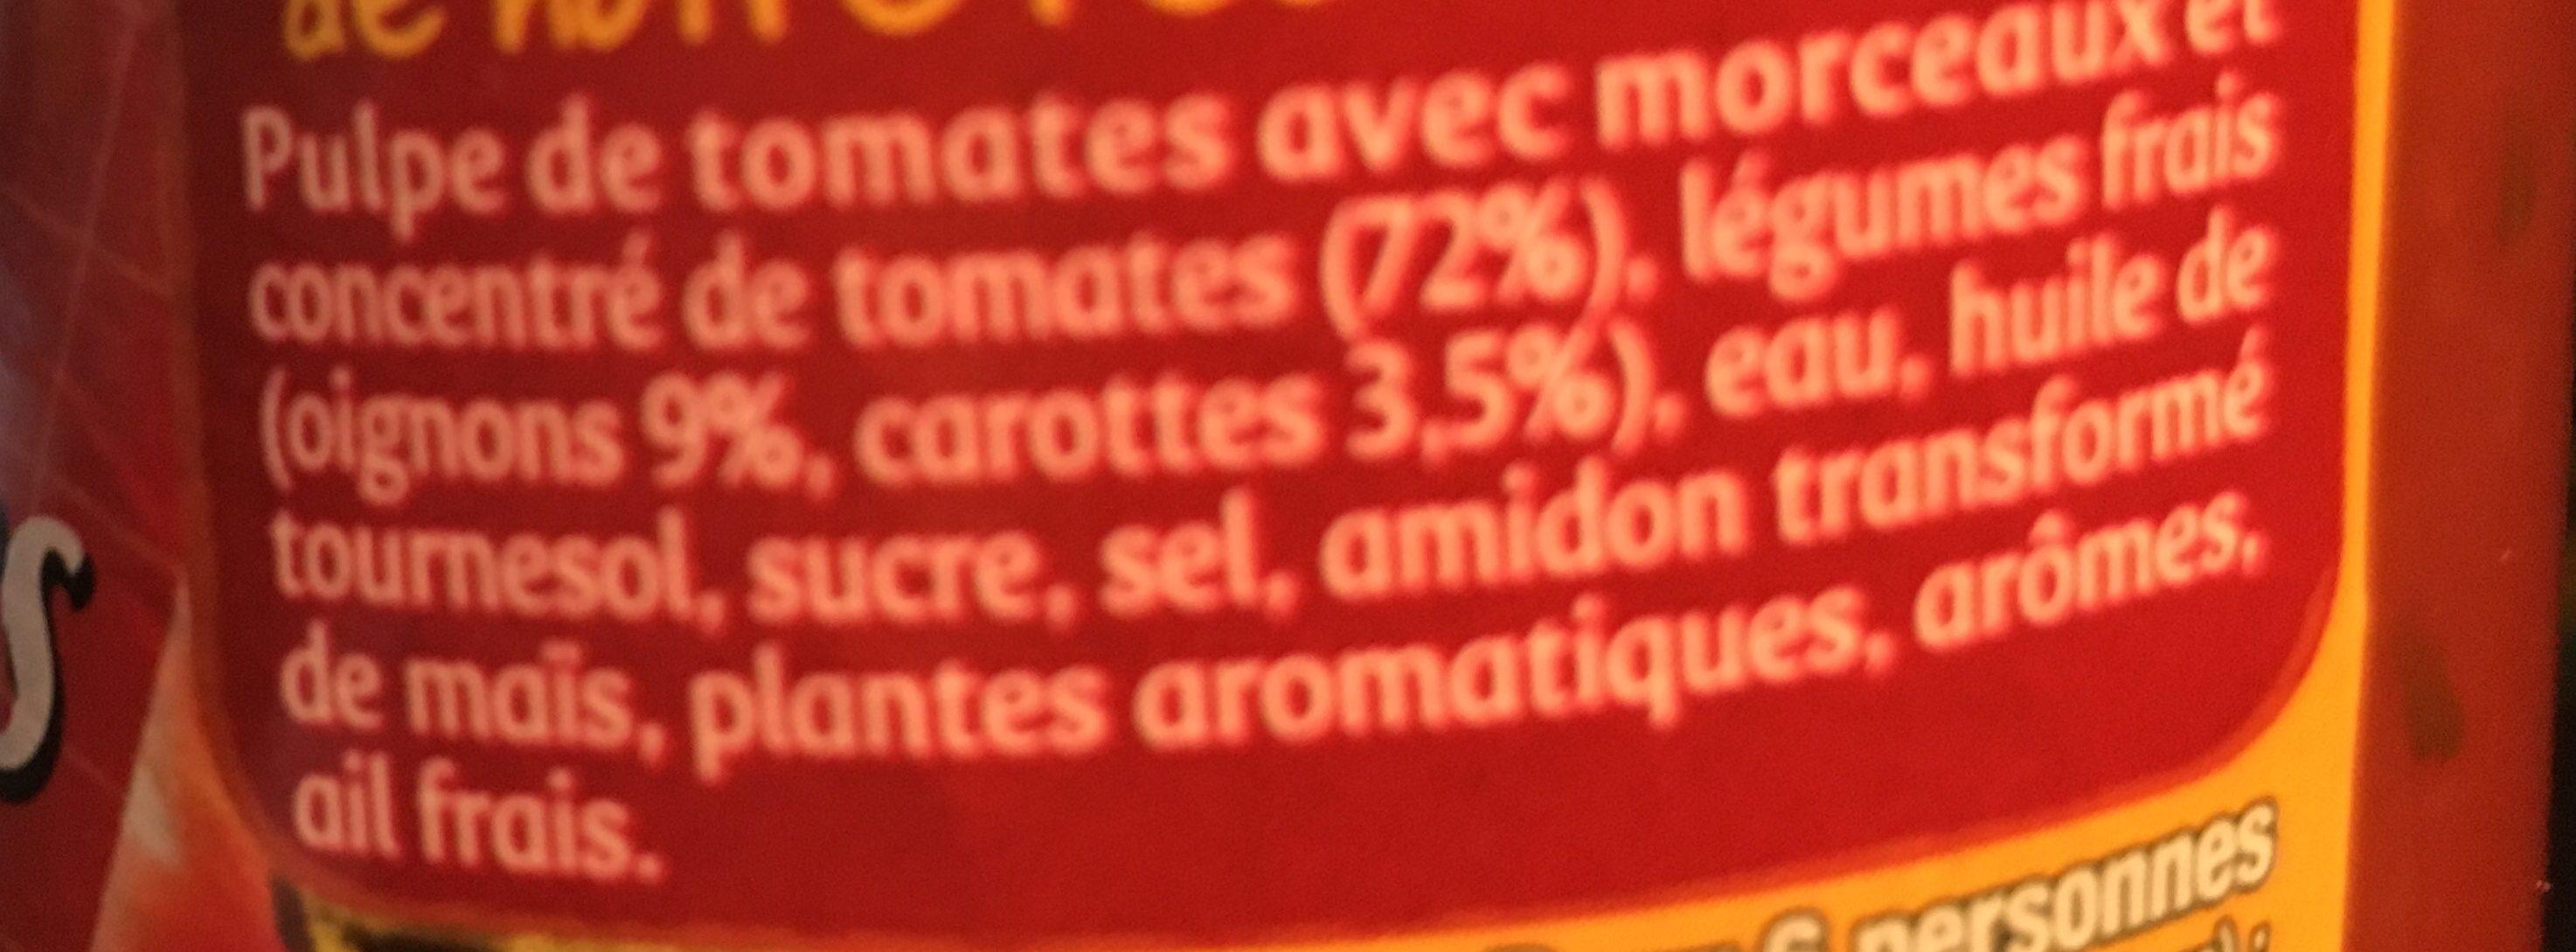 Panzani - spf - sauce tomates cuisinées - Ingrédients - fr